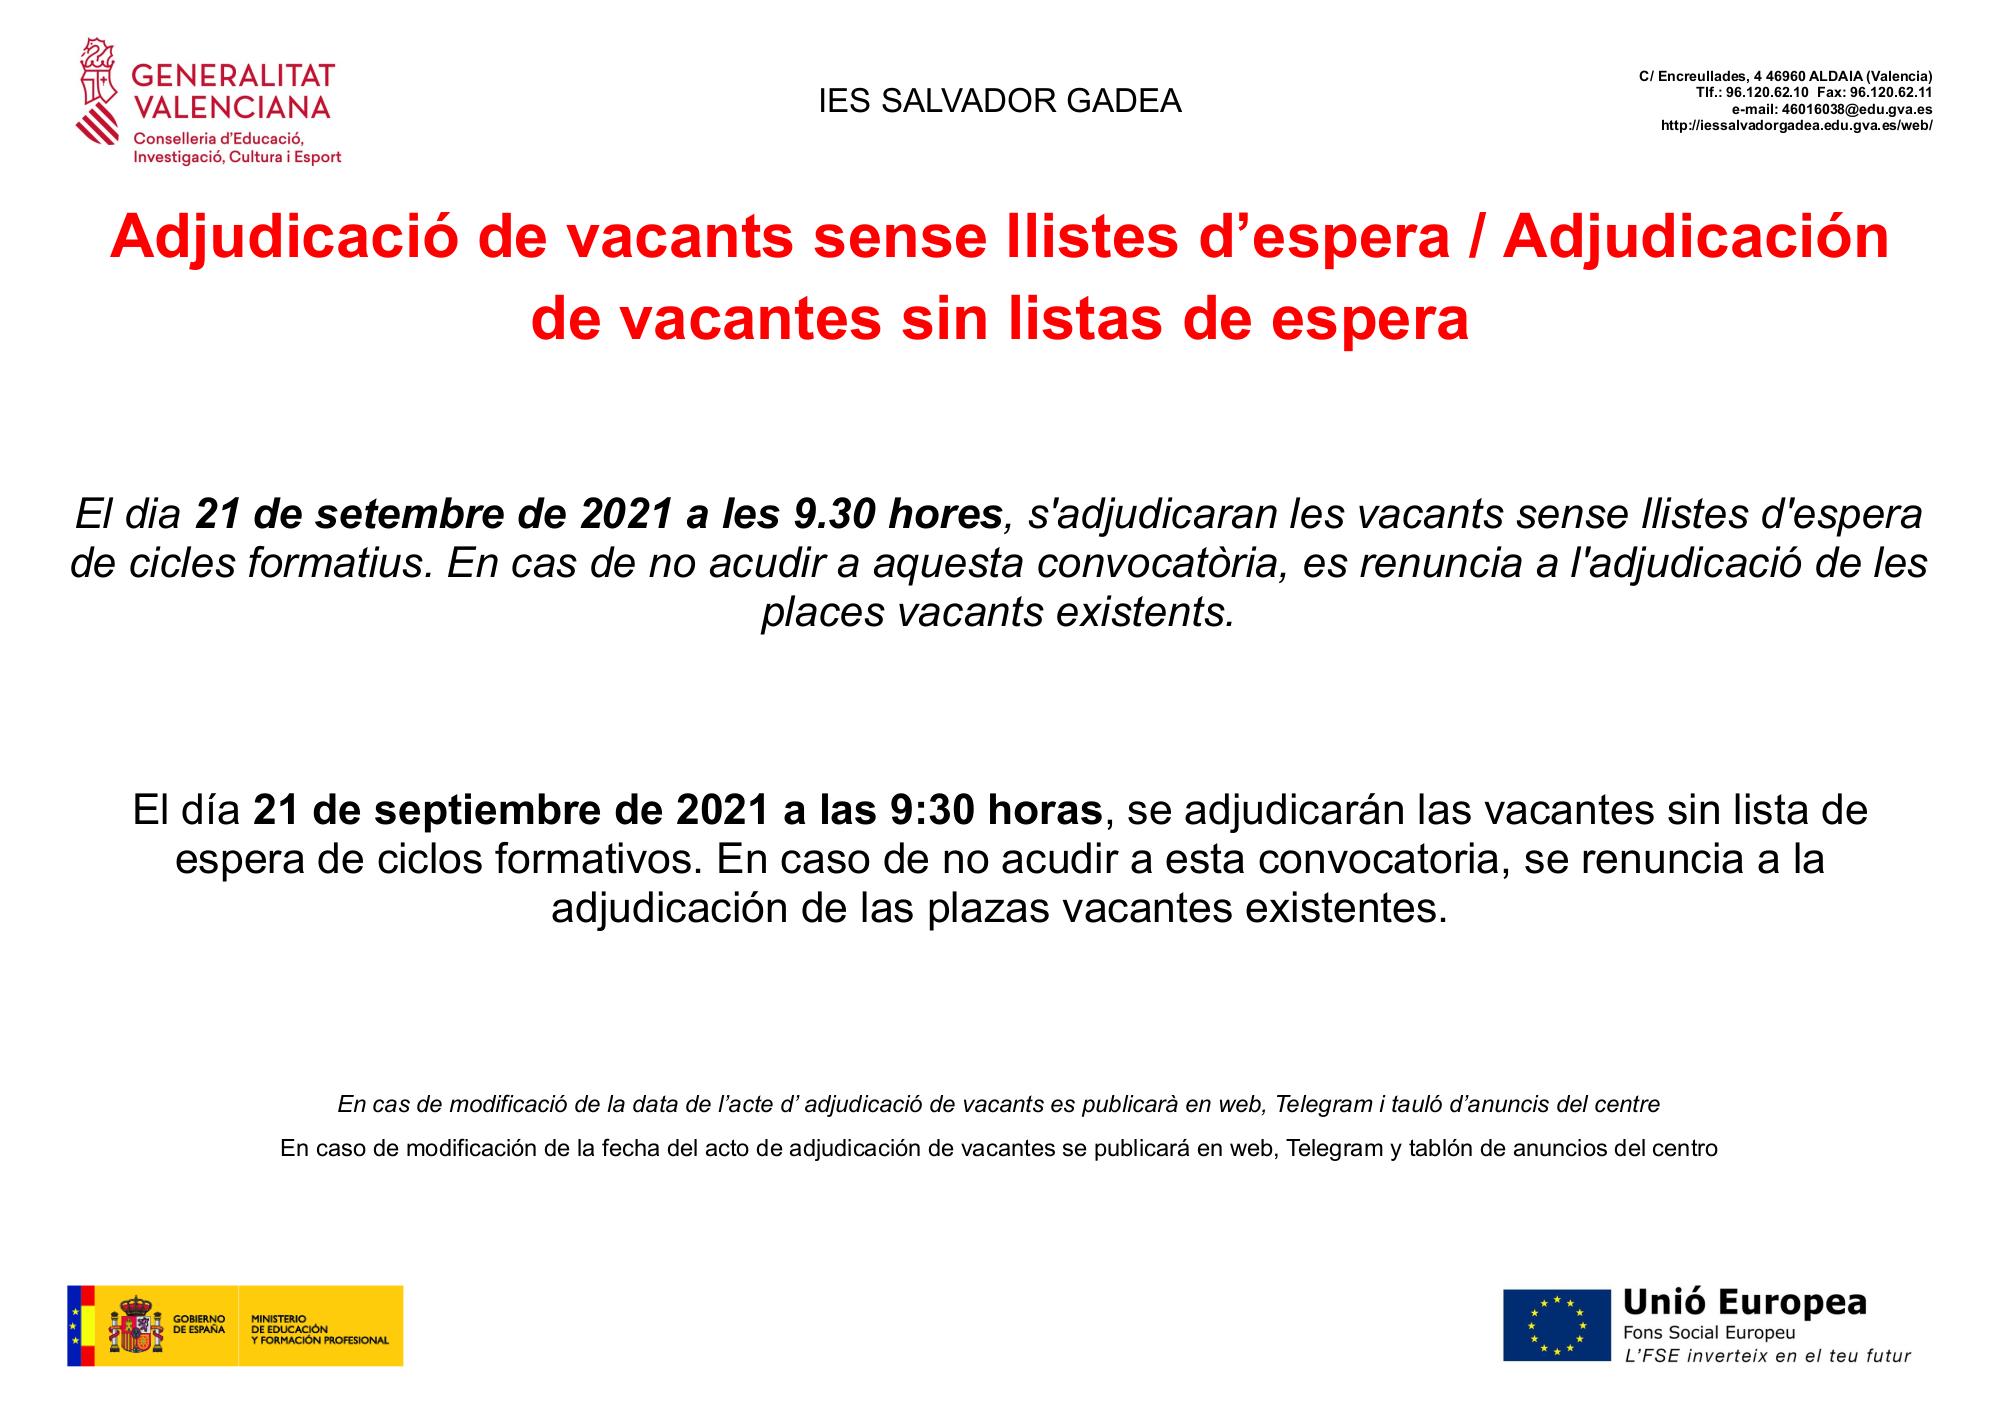 AdjudicacionVacantesSinListaEspera2021-2022